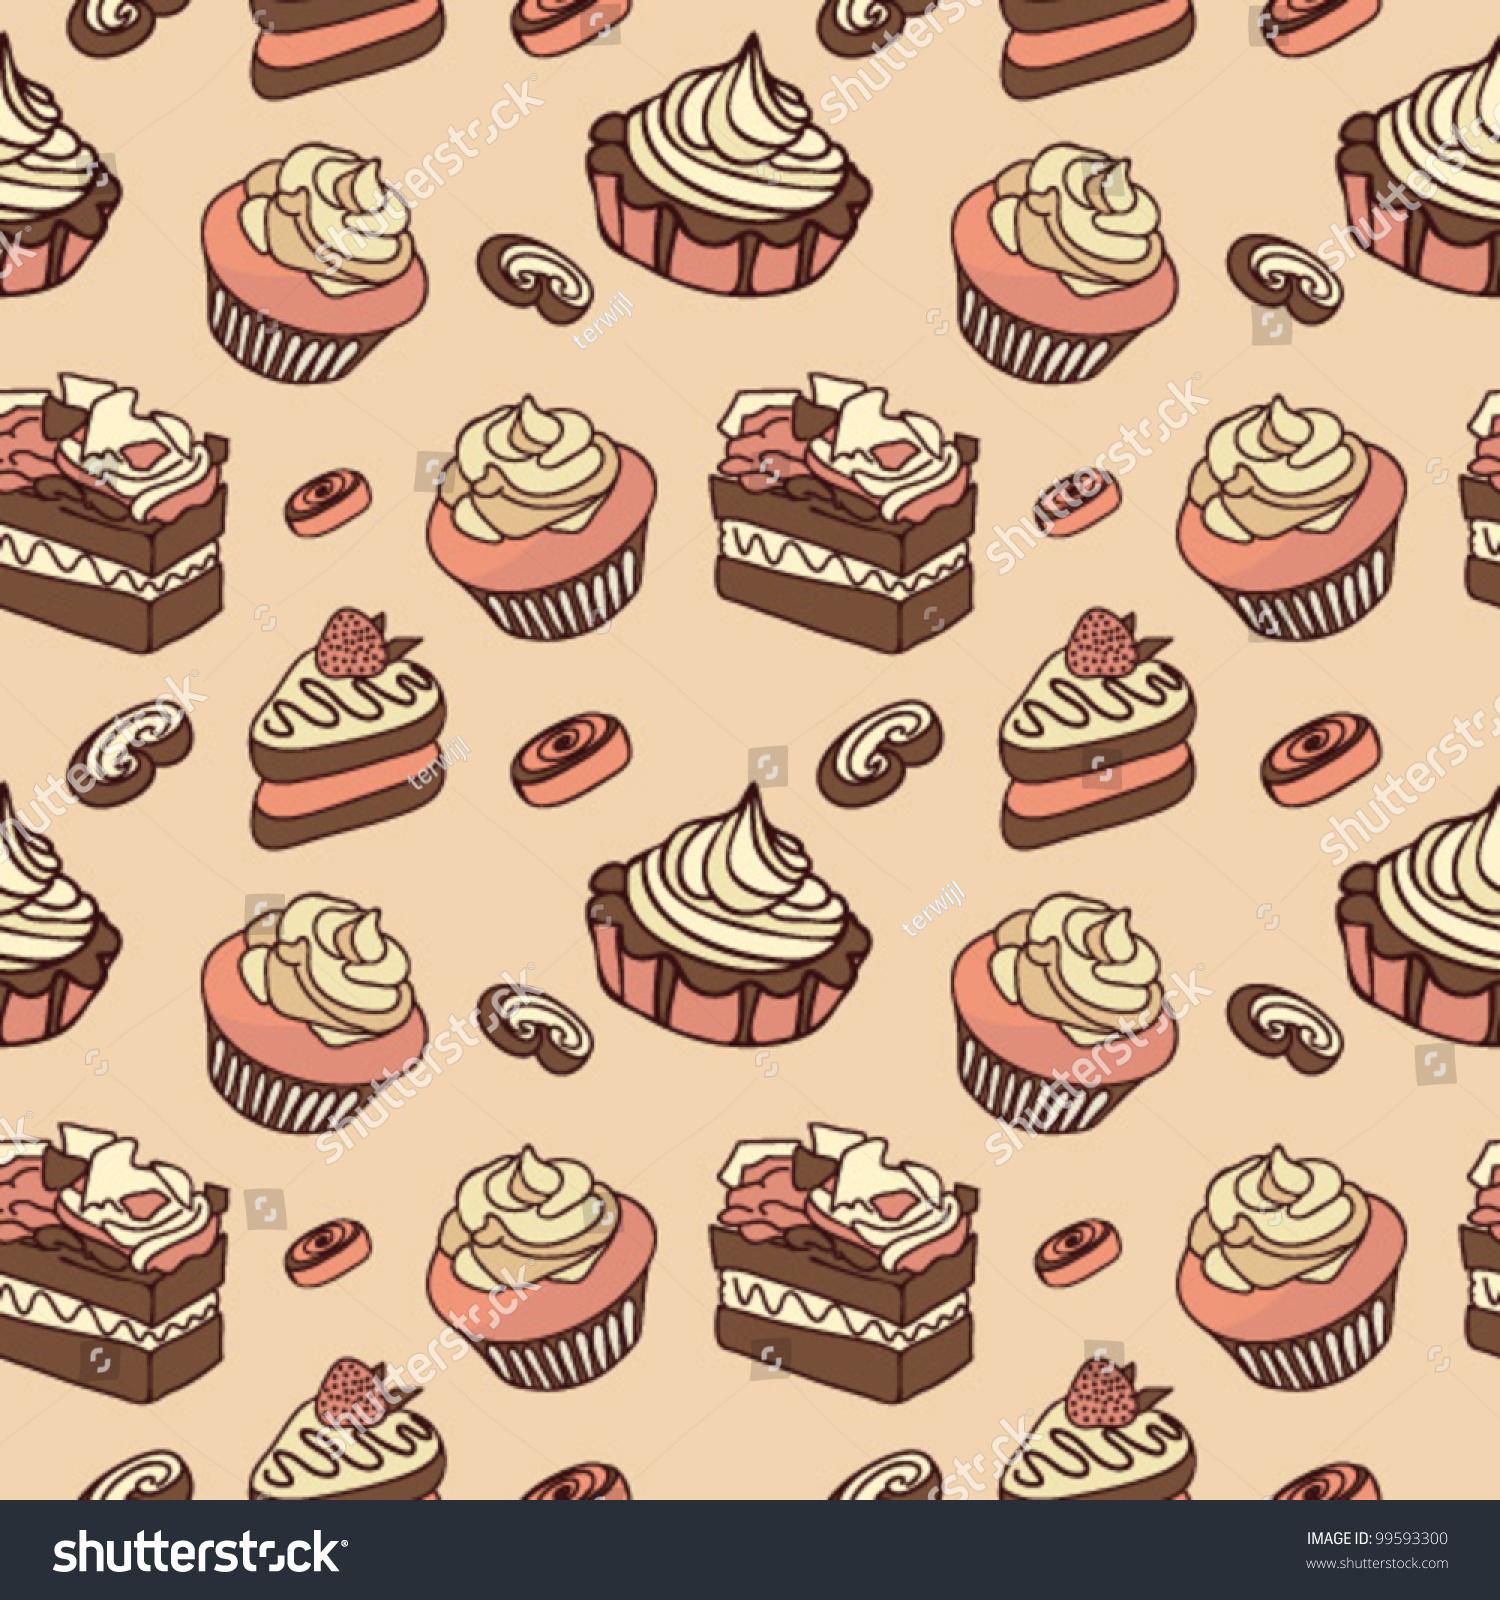 vector cupcake wallpaper